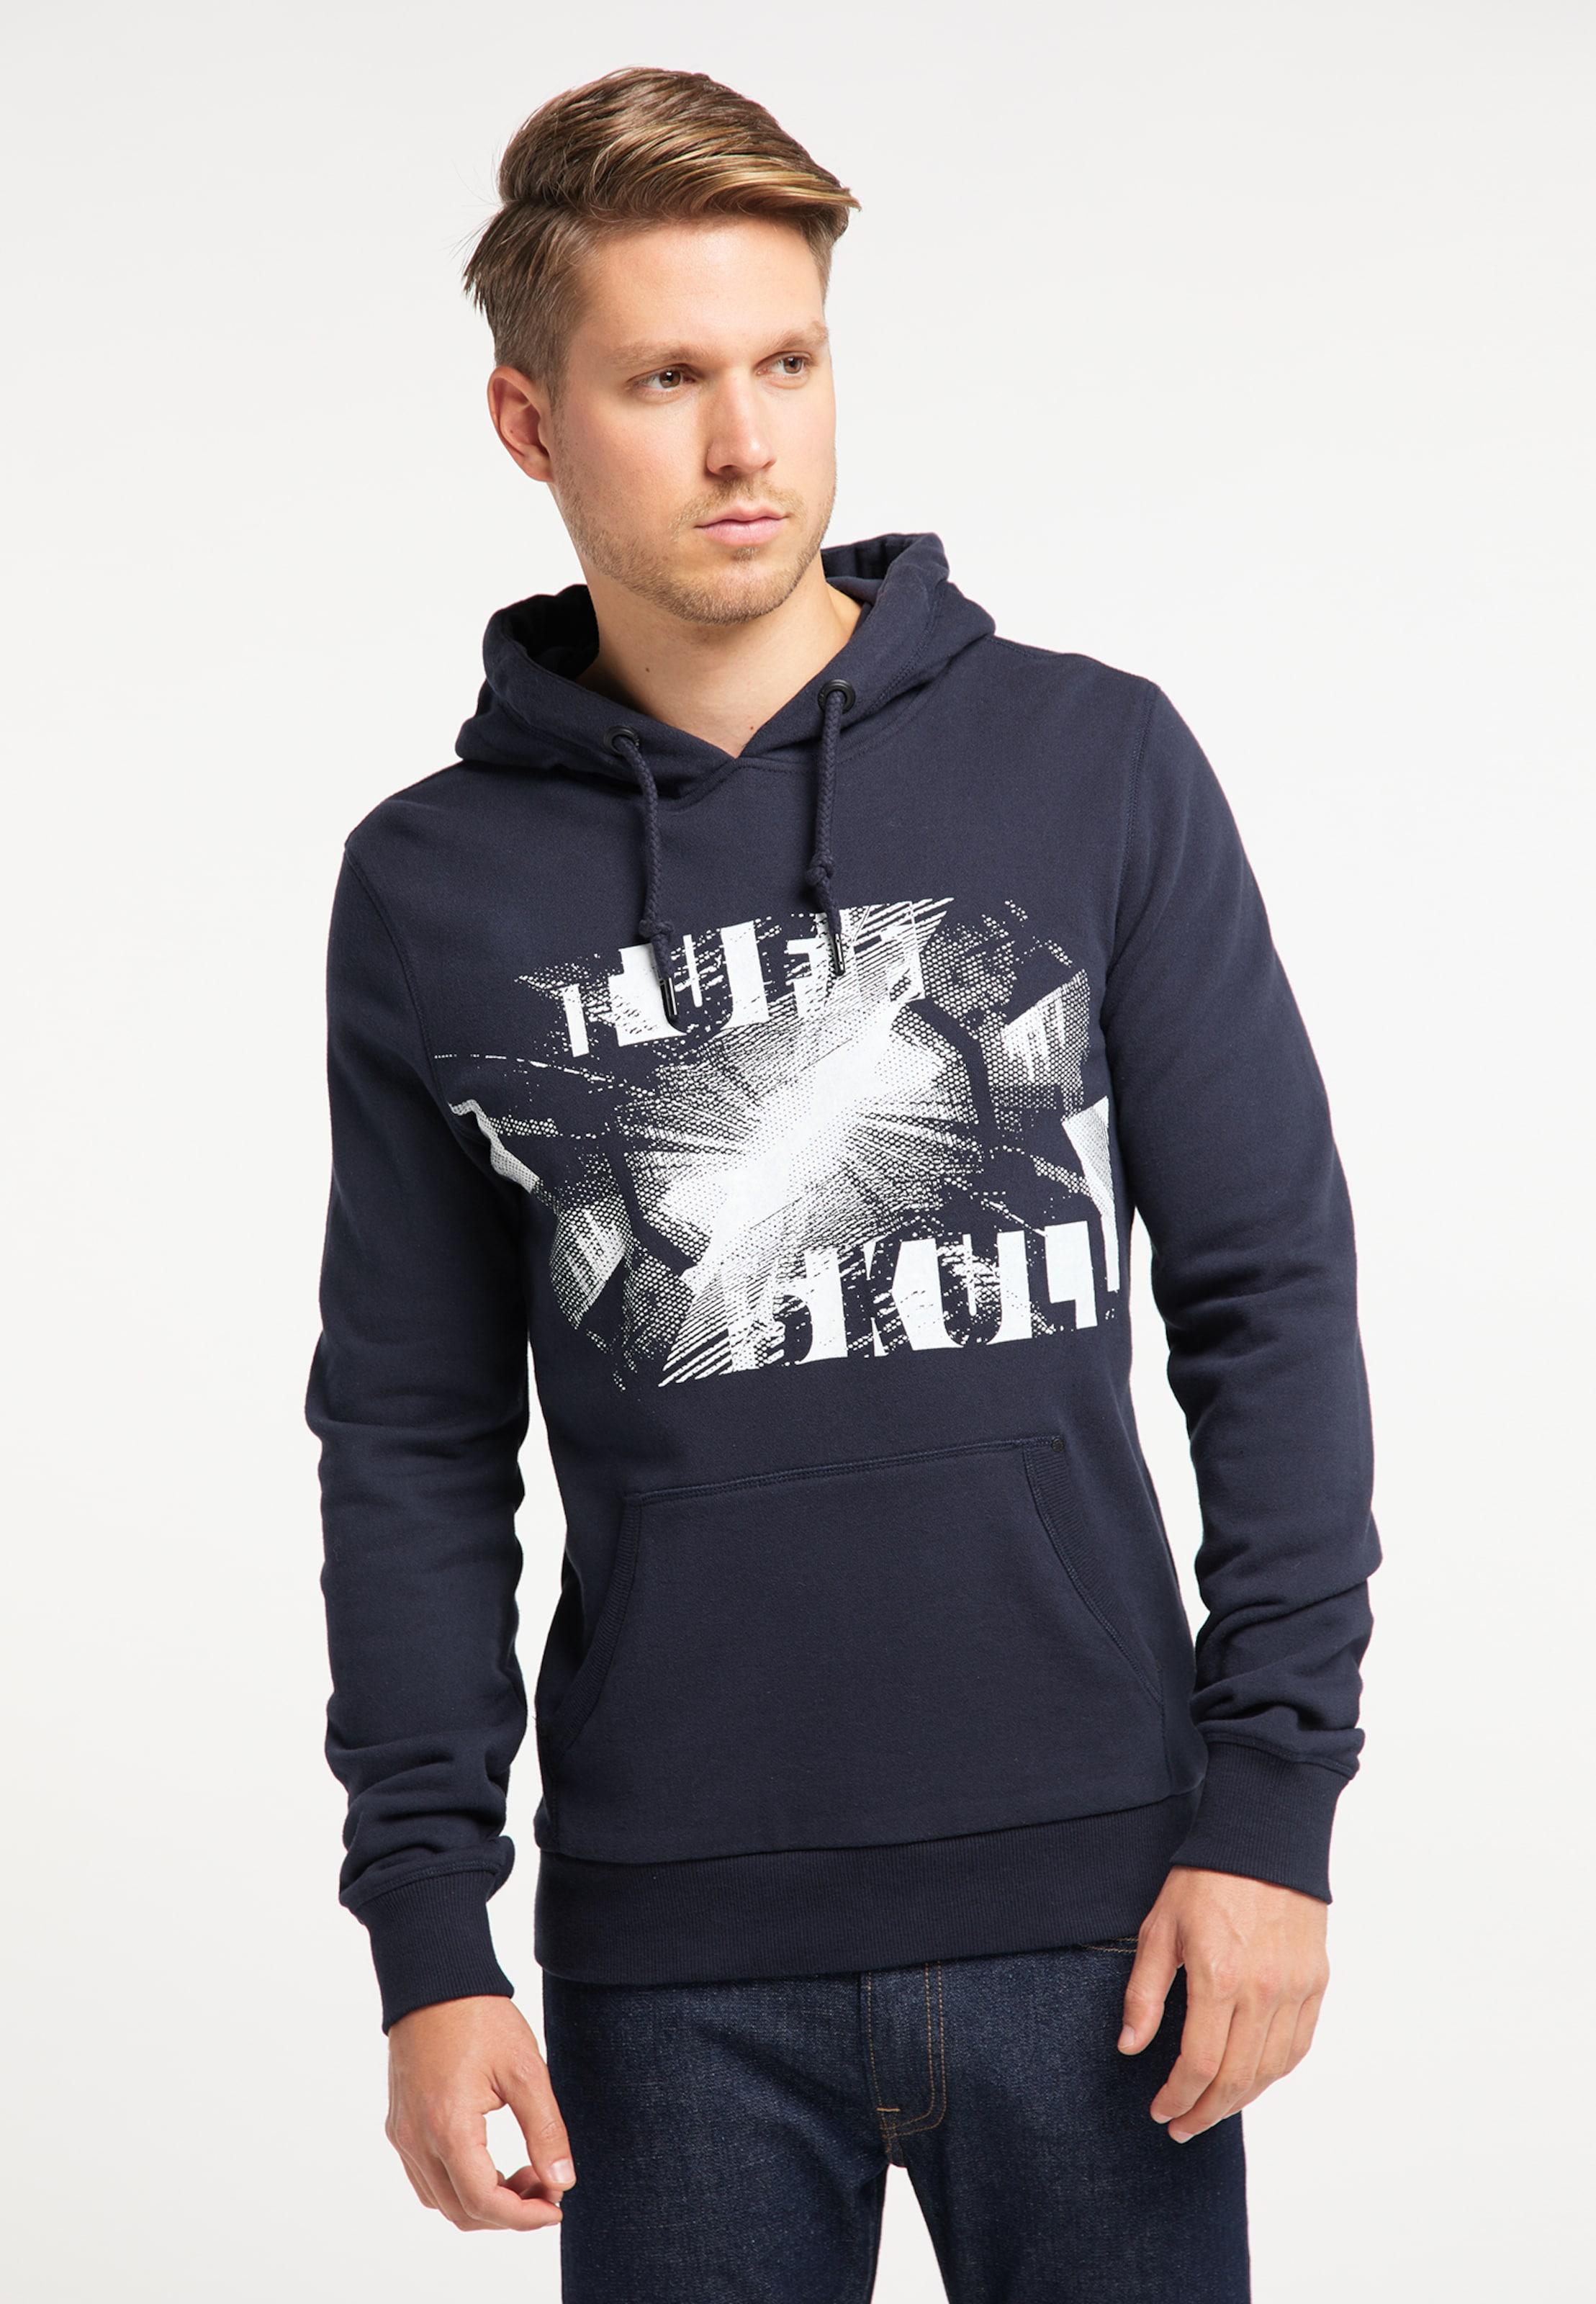 TUFFSKULL Sweatshirt in marine / weiß Sweatstoff 4059275432043